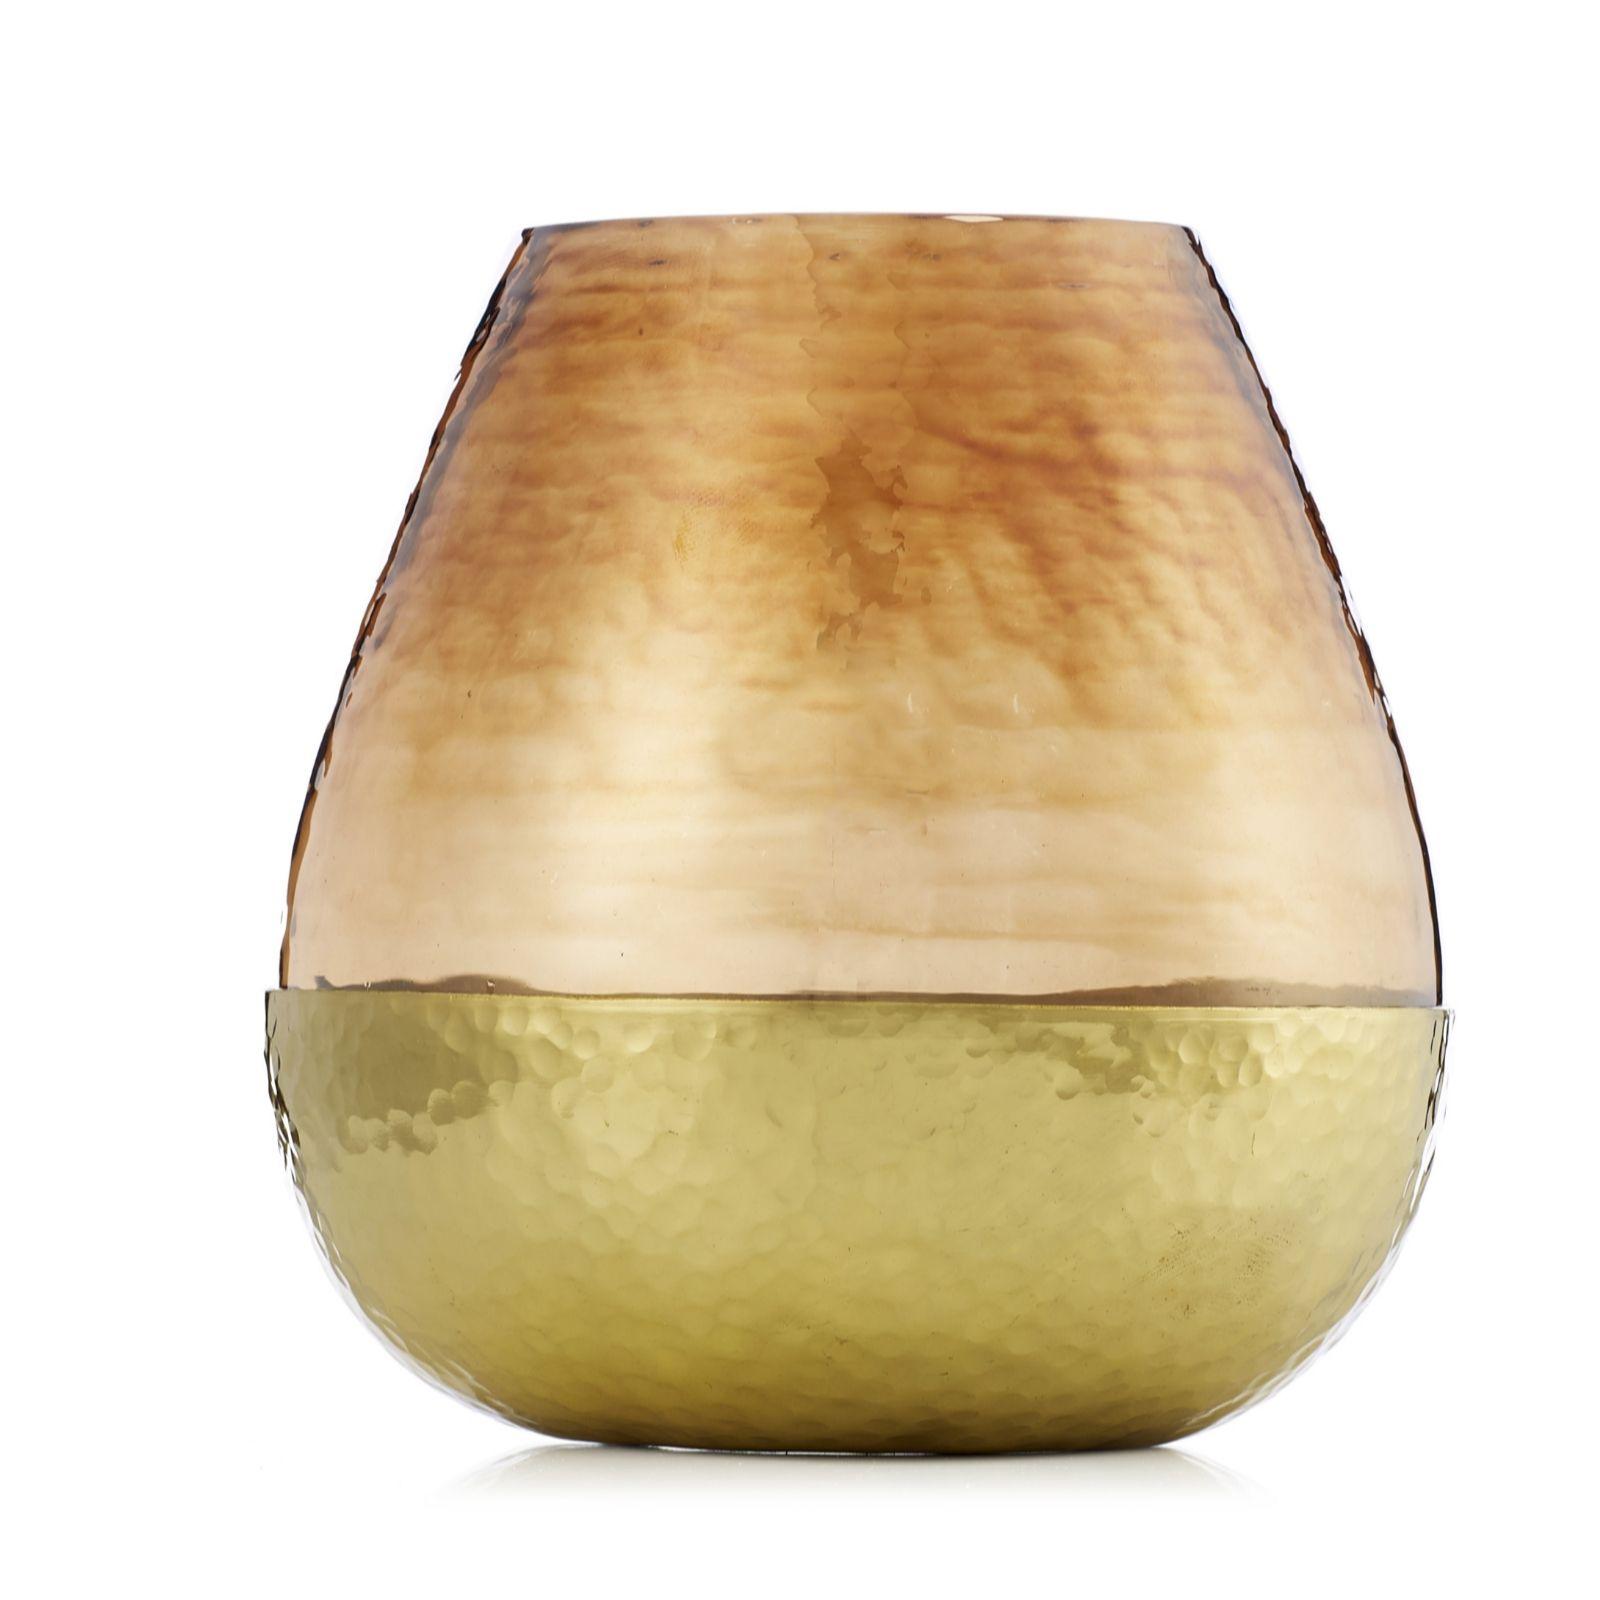 Kelly hoppen small hammered brass vase qvc uk reviewsmspy